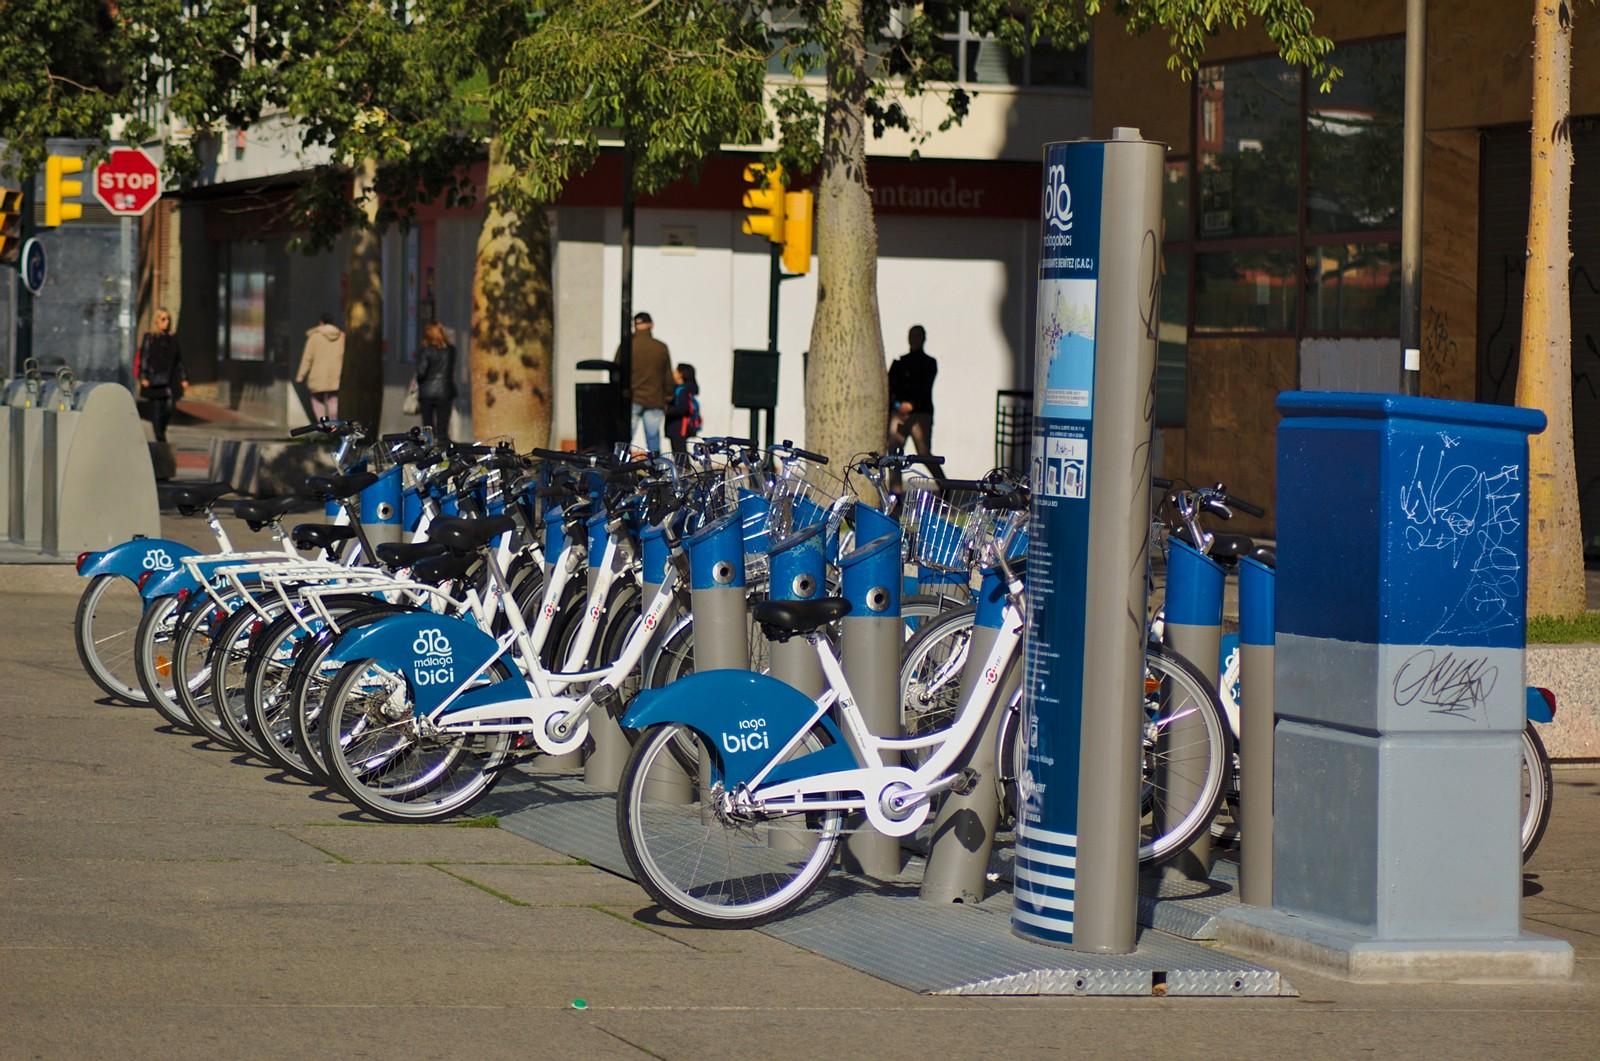 Alquiler de bicicletas compartidas